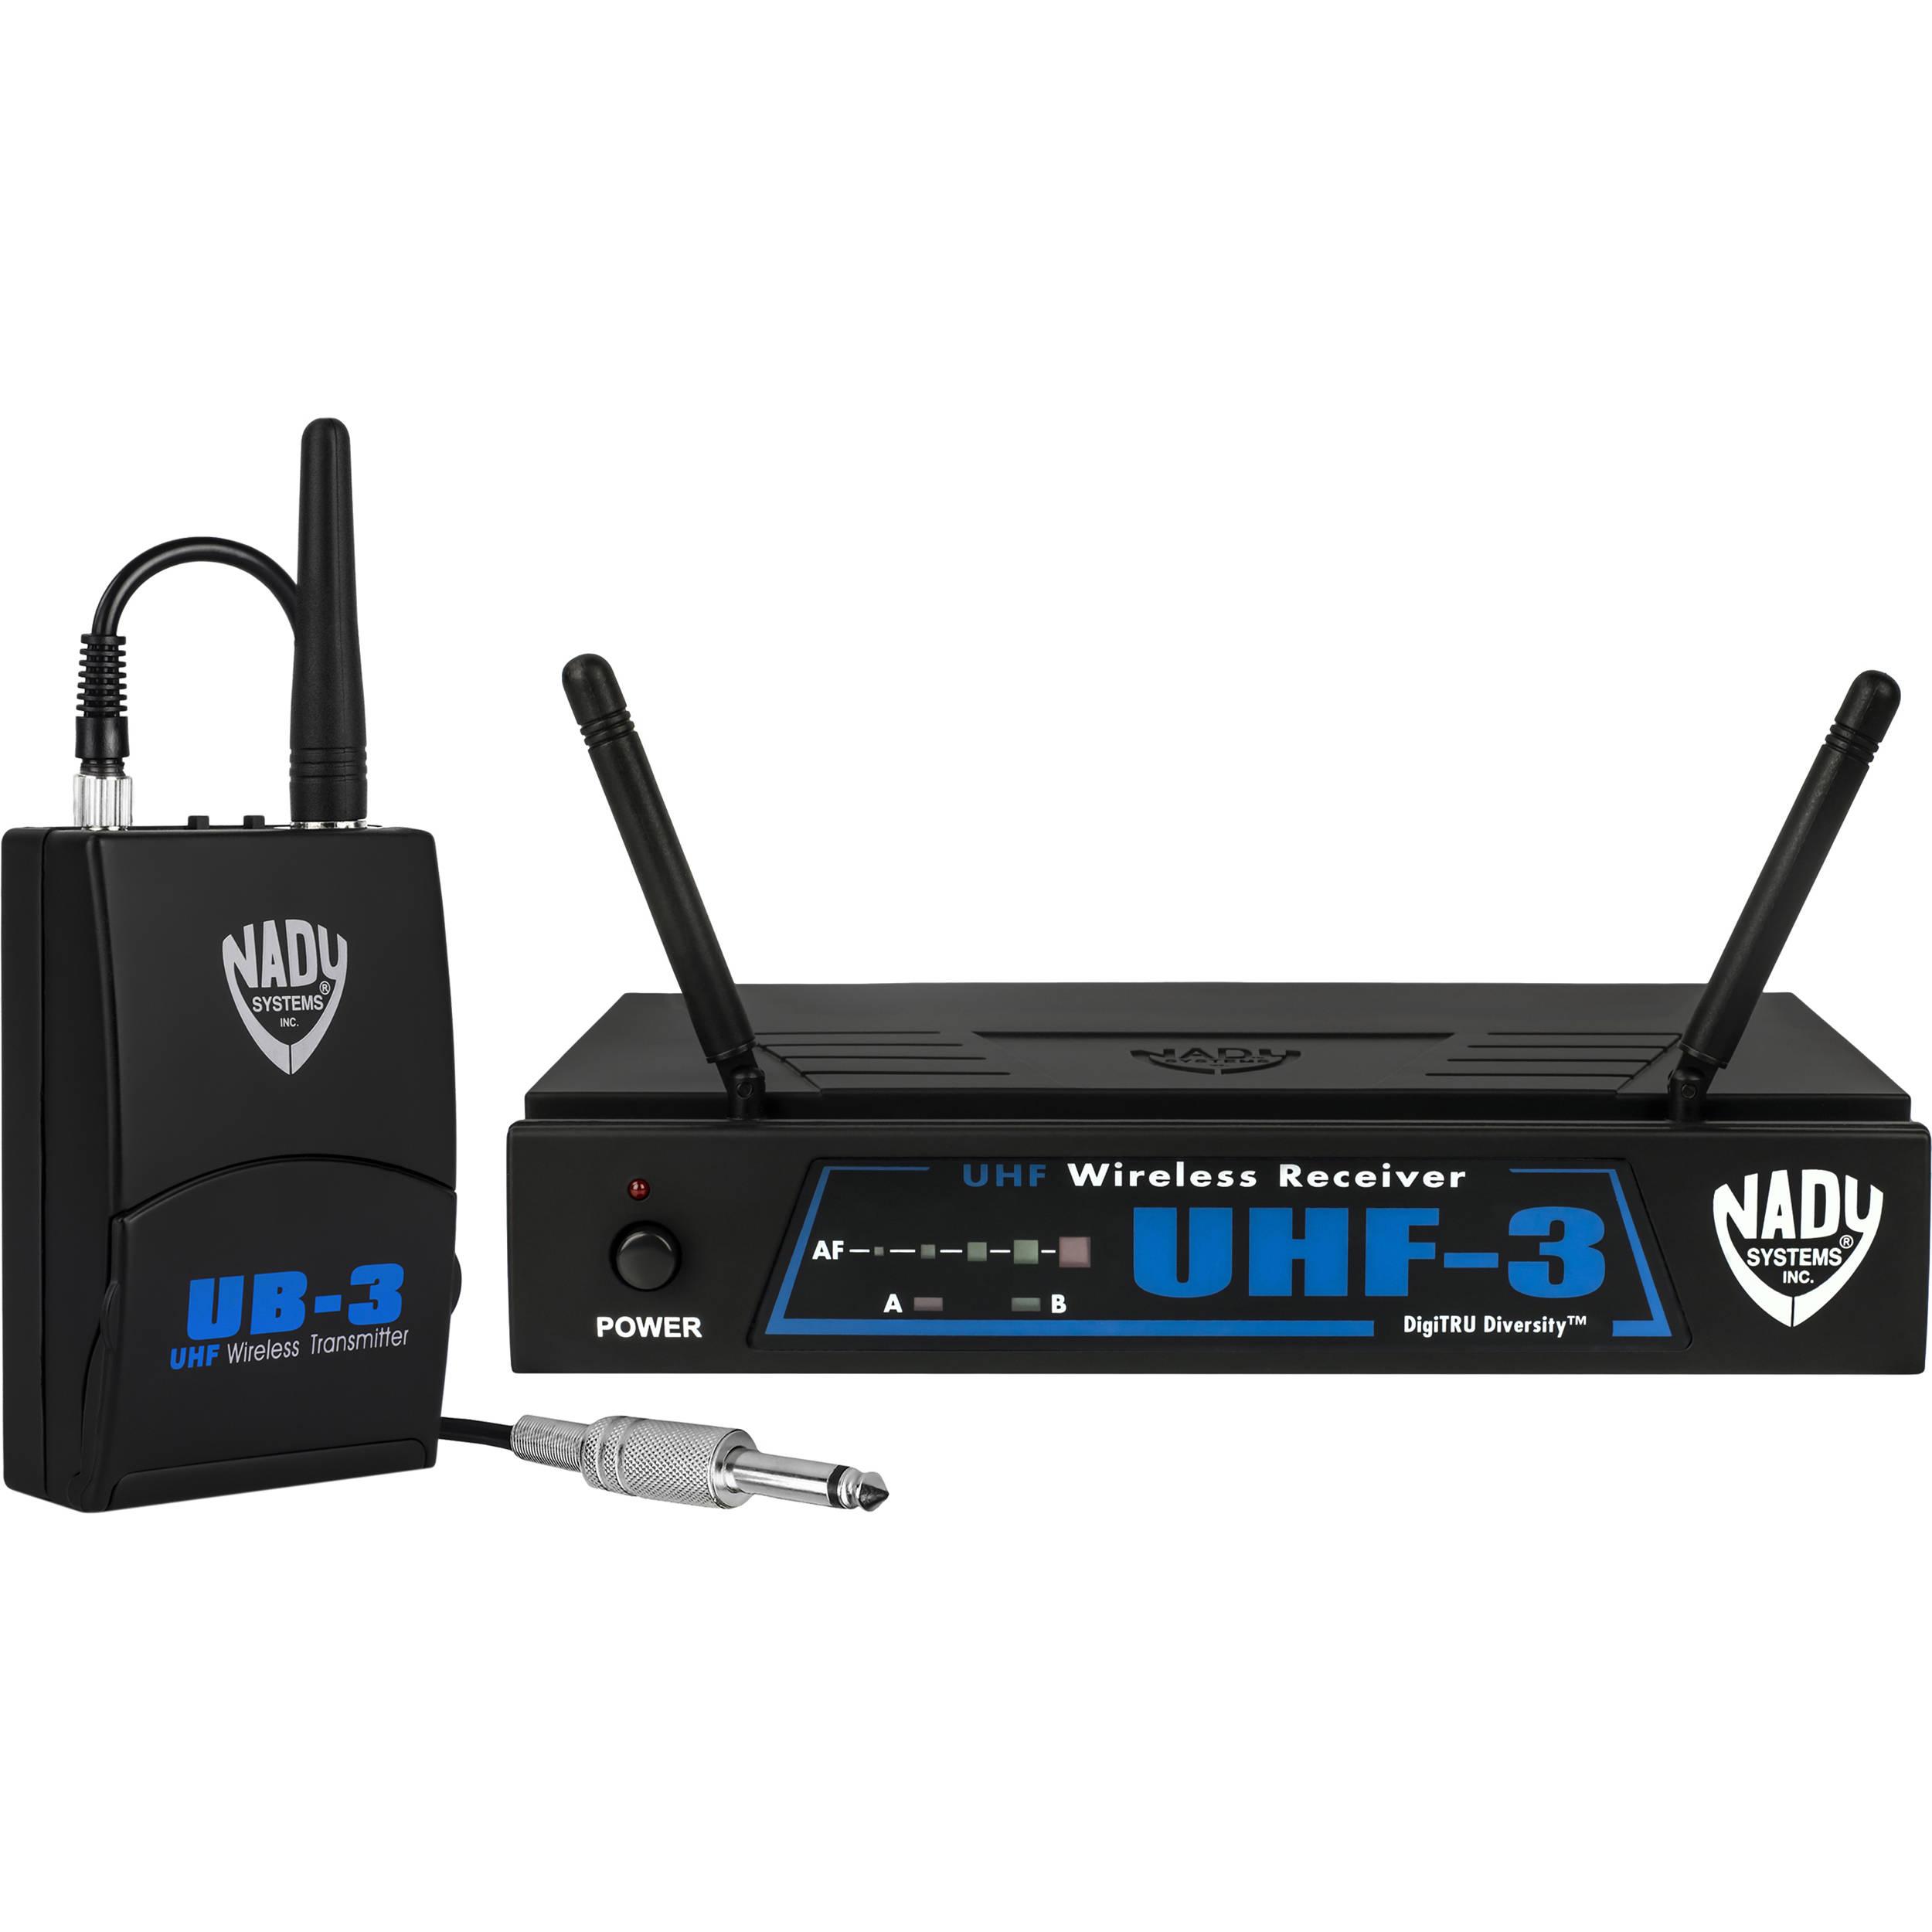 Uhf Wireless Guitar System Trusted Wiring Diagram Airline Nady 3 Diversity Gt Mu6 Bh Samson 77